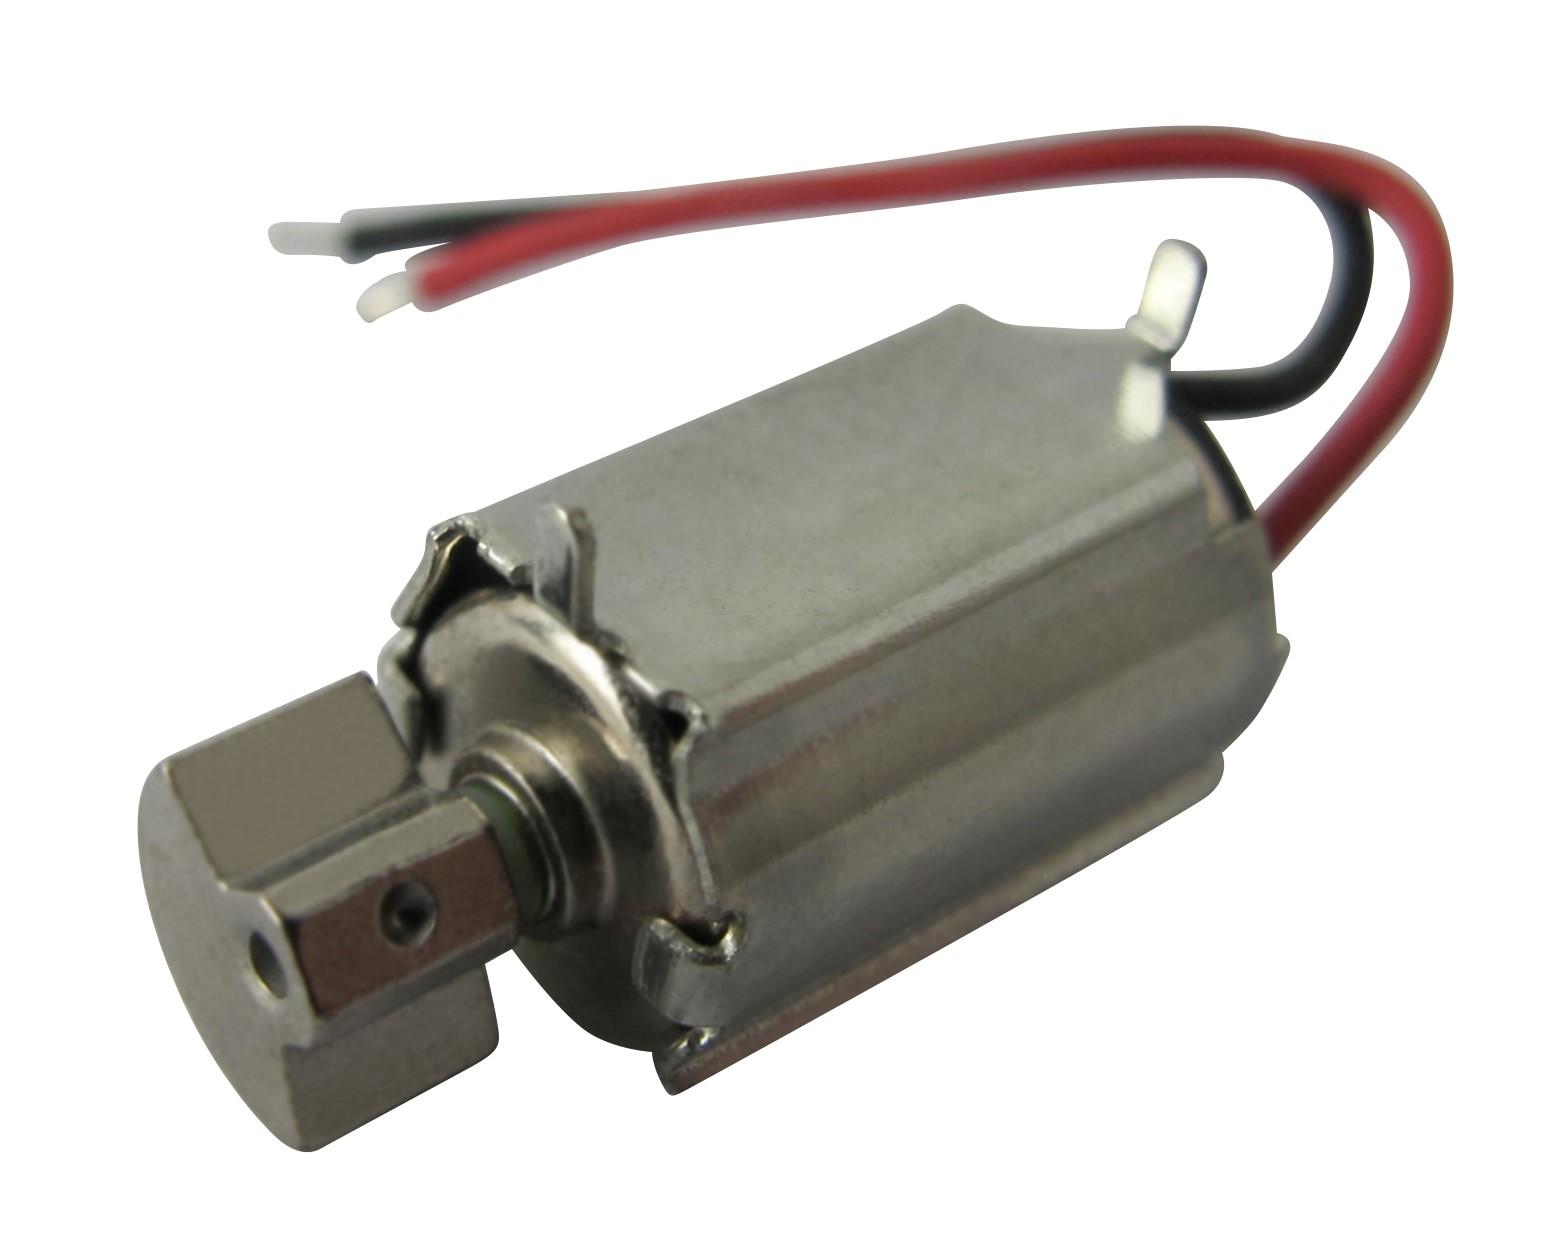 Z6SL2B0060071 Cylindrical Vibrator Motor